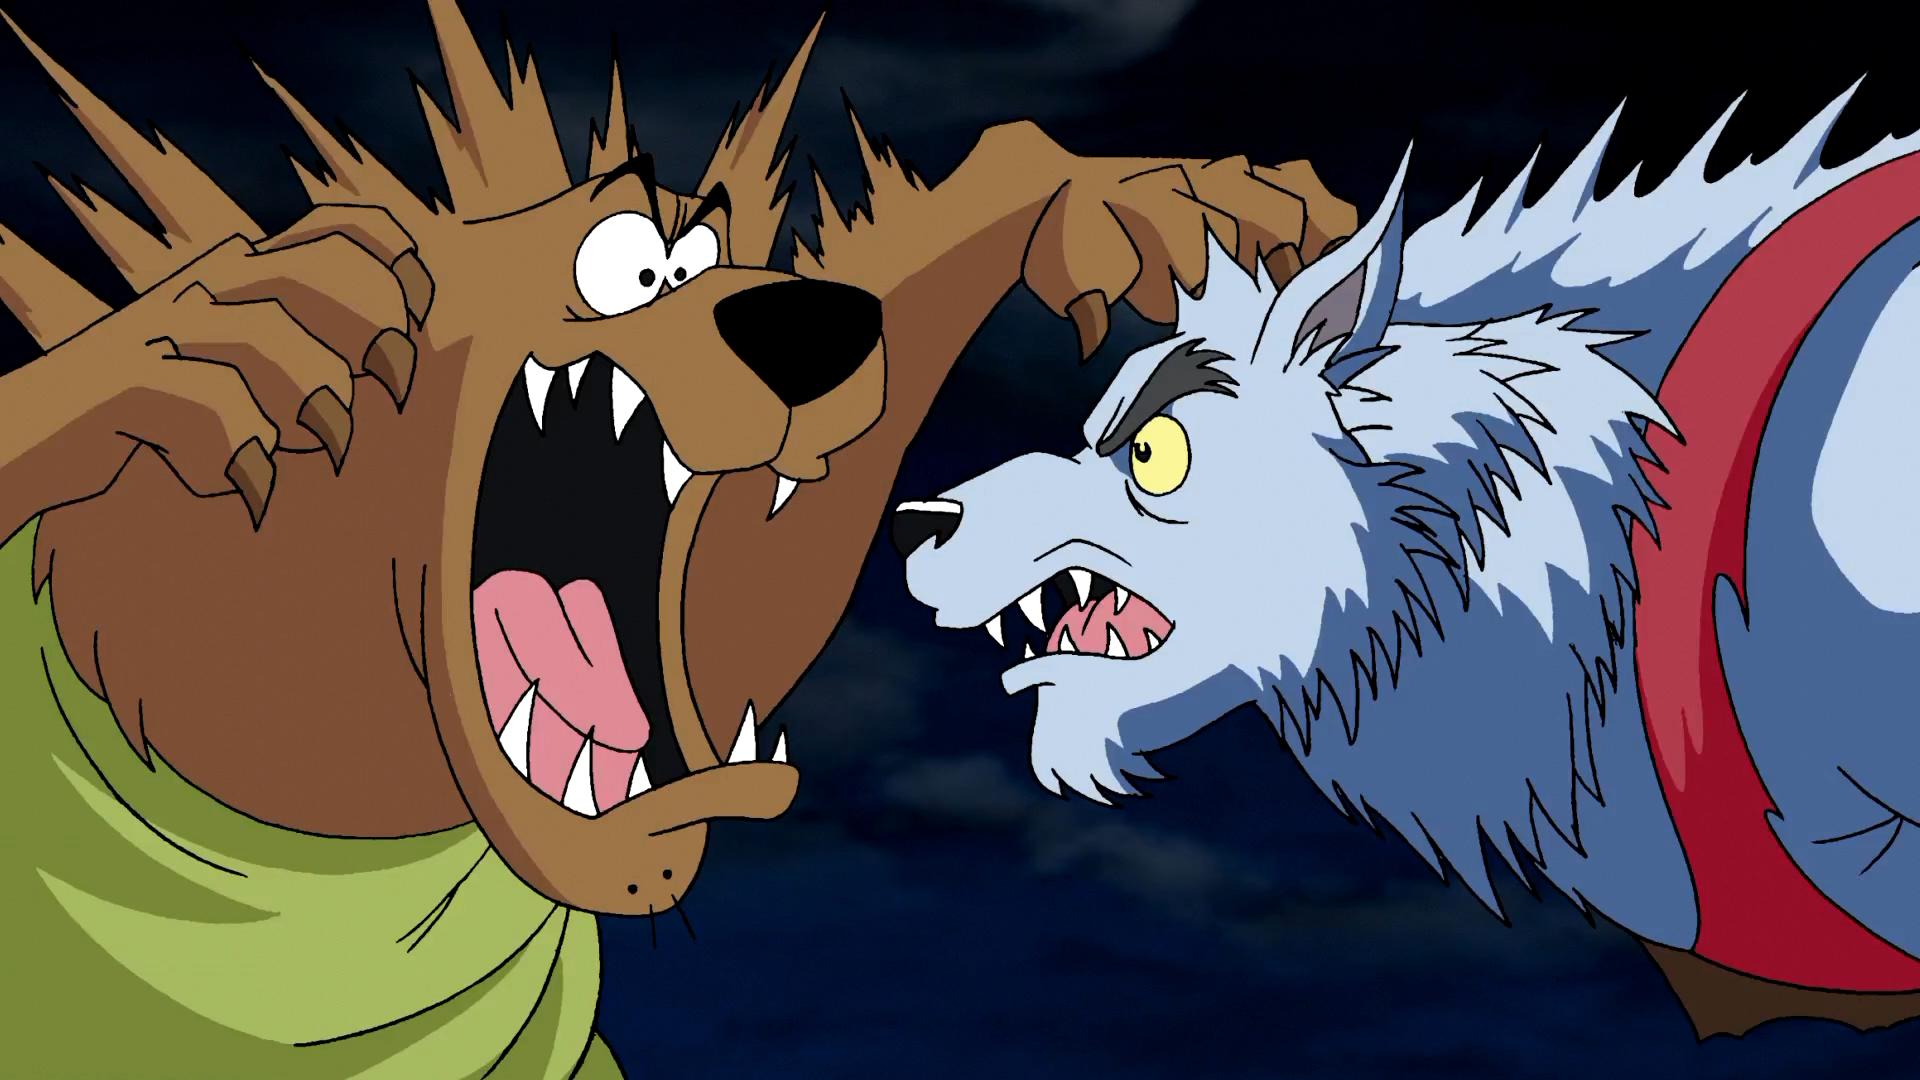 2008 Scooby-Doo! and the Goblin King WEB-DL 1080p [Dub Пифагор] [MVO Бест Кино] [ENG] {RUS} {ENG} (CHP-n).mkv_20210317_140957.424.png